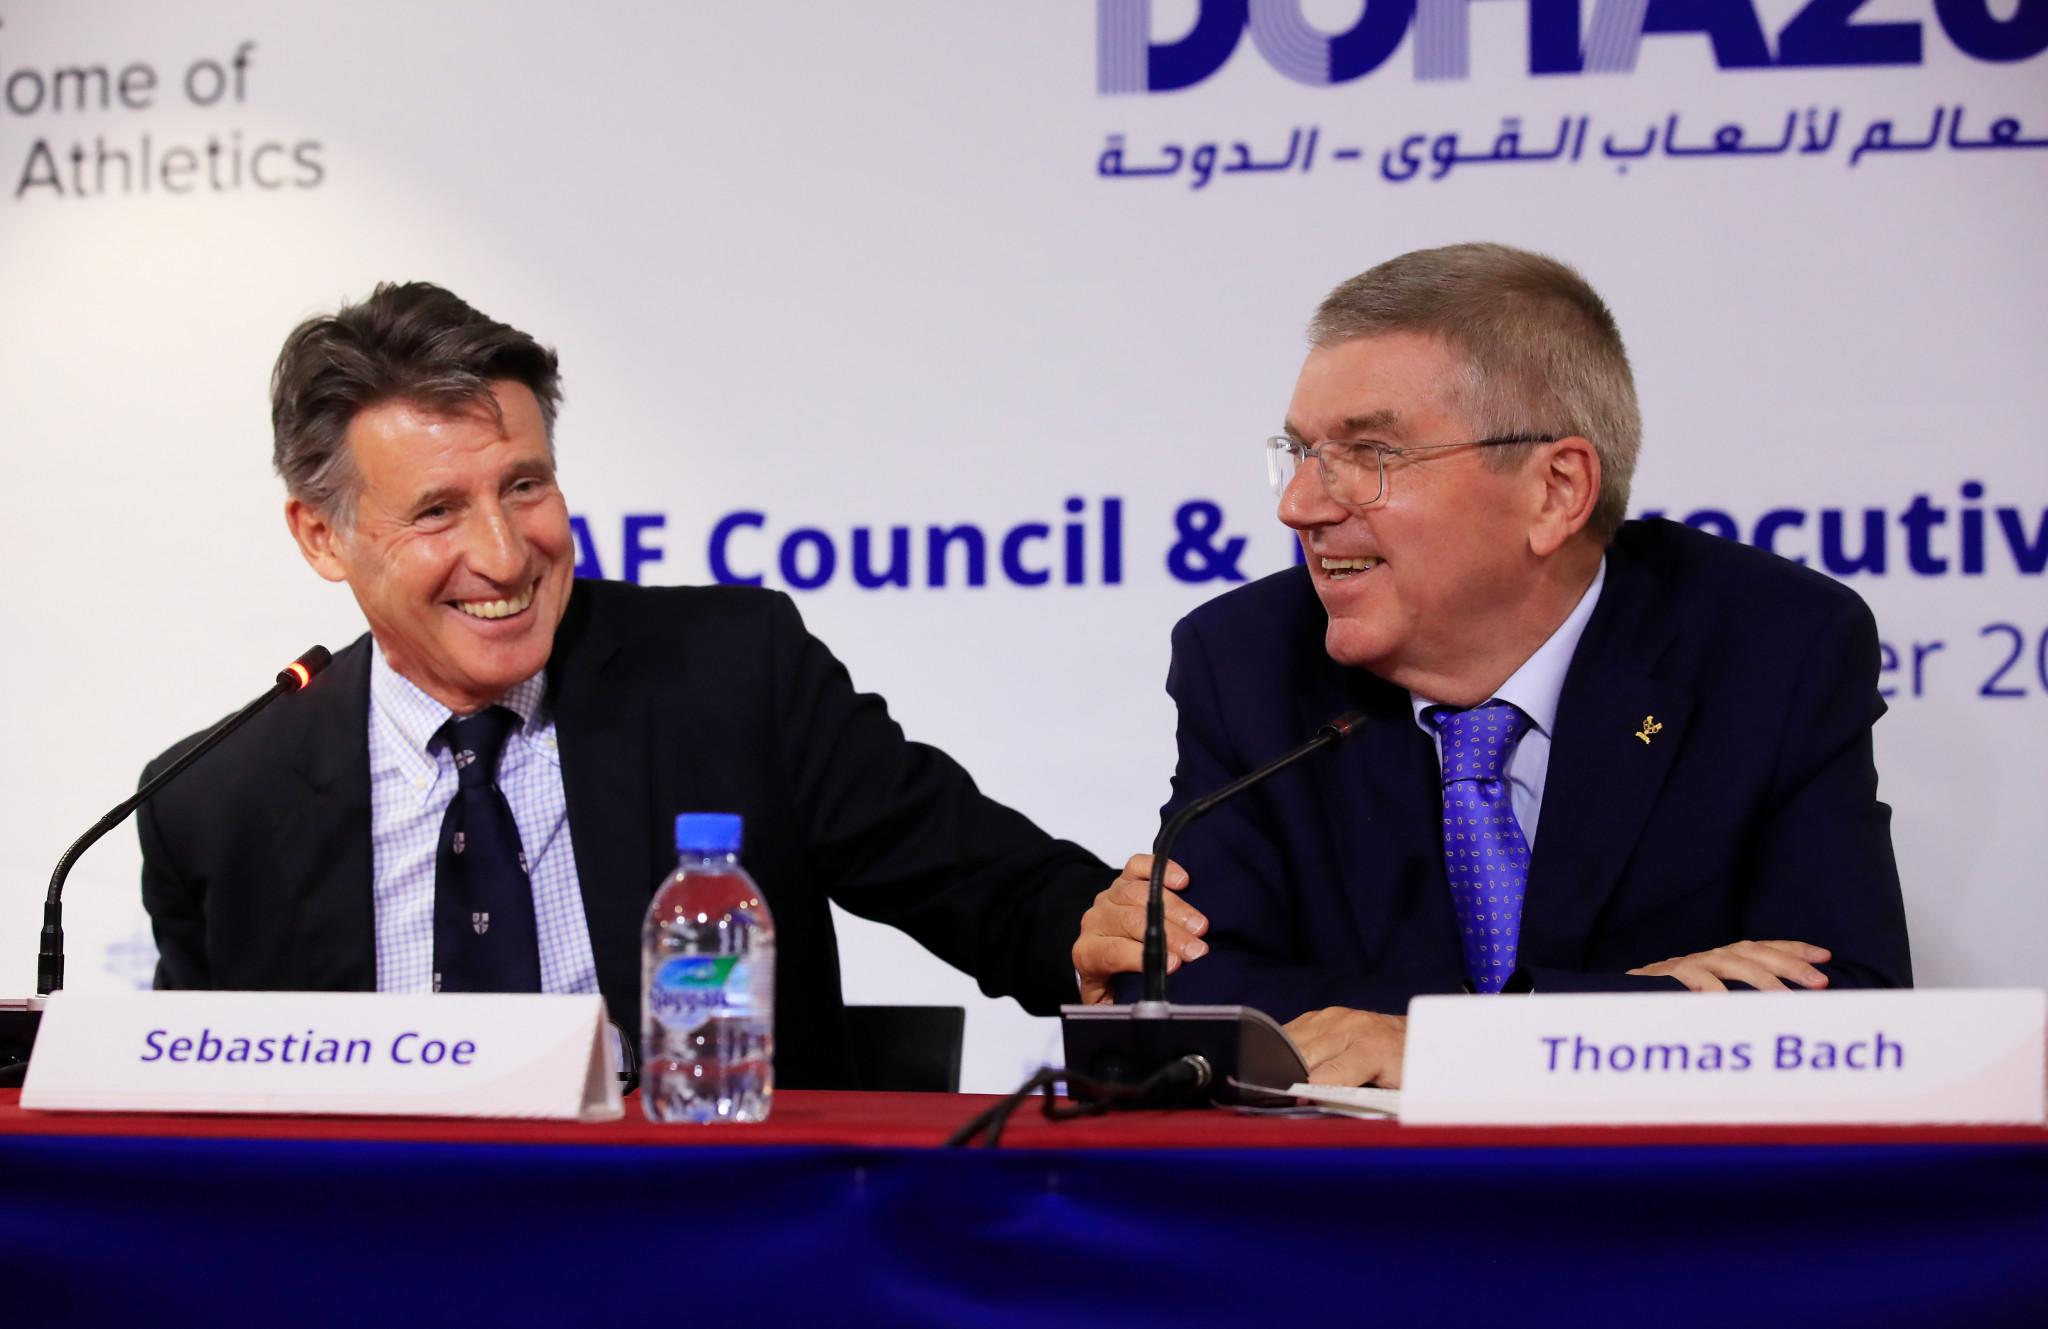 Sebastian Coe, head of the London 2012 Organising Committee, reckons